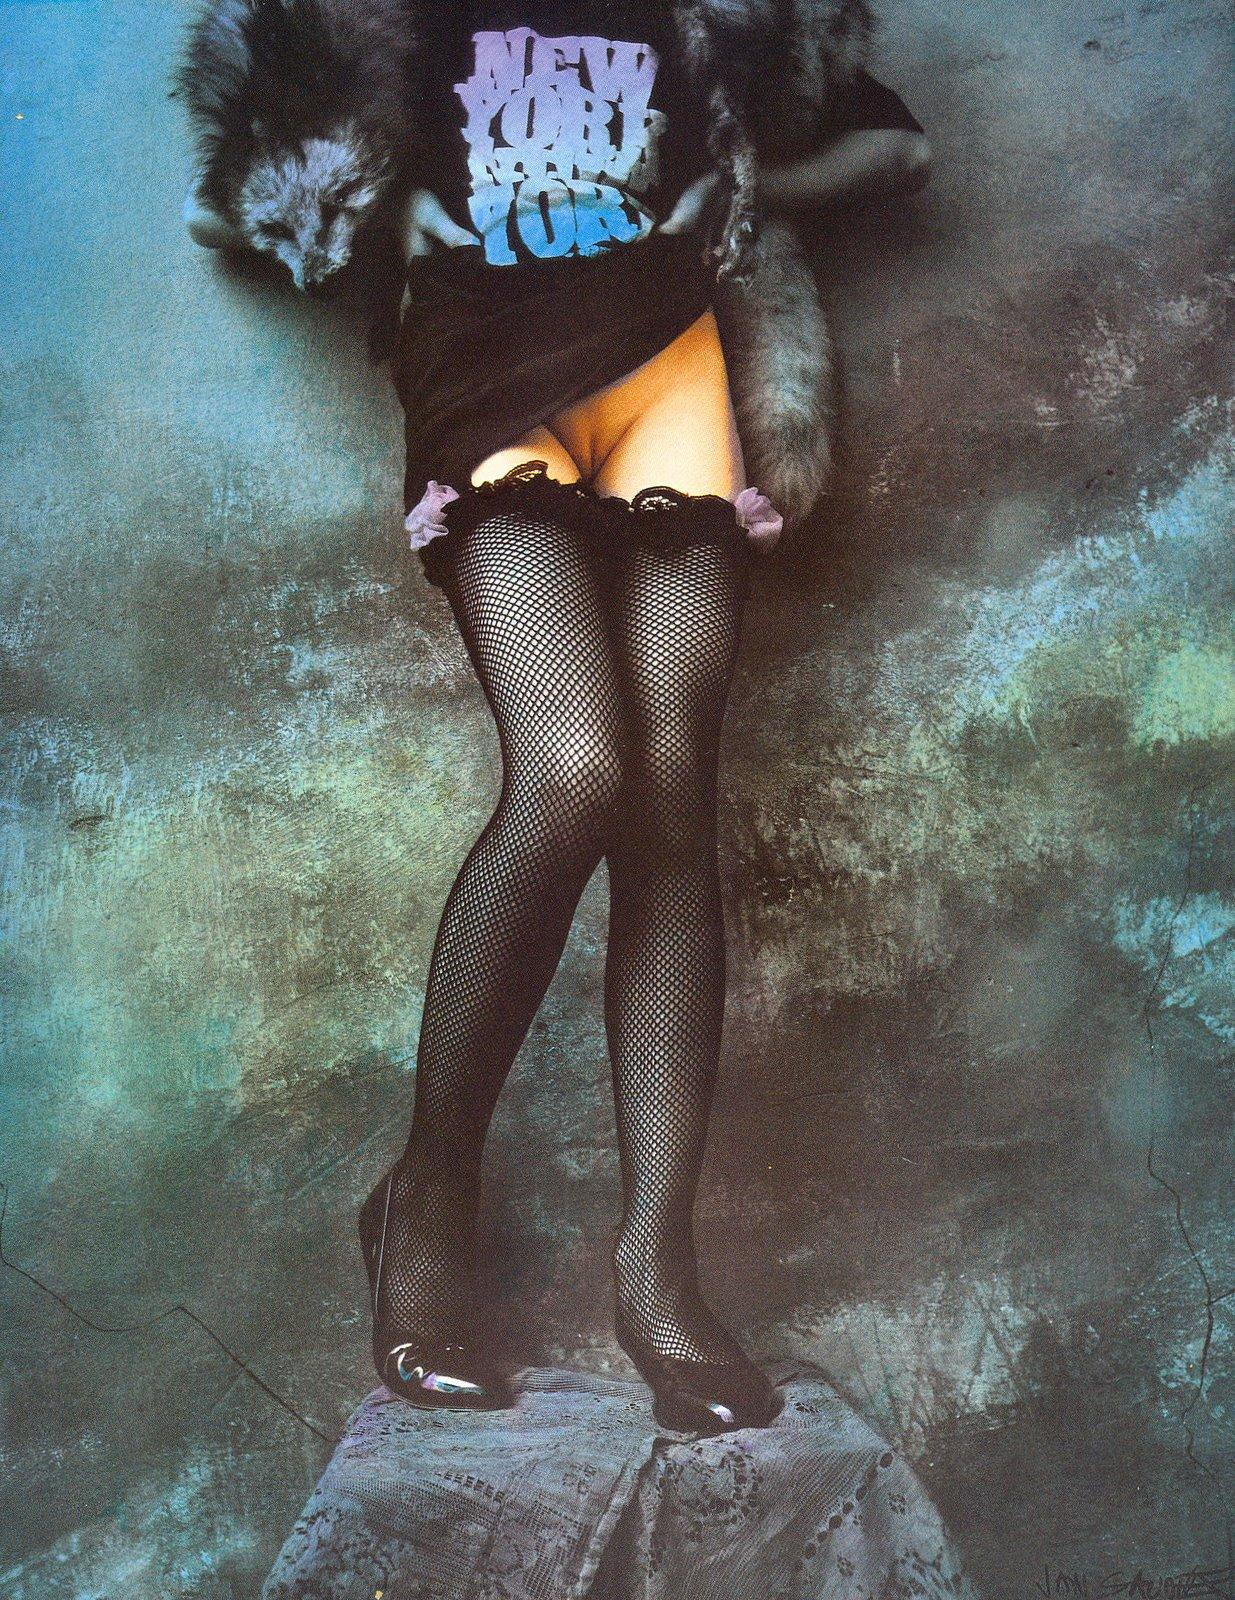 """NEW YORK '85"", ΦΩΤΟΓΡΑΦΟΣ: JAN SAUDEK!"